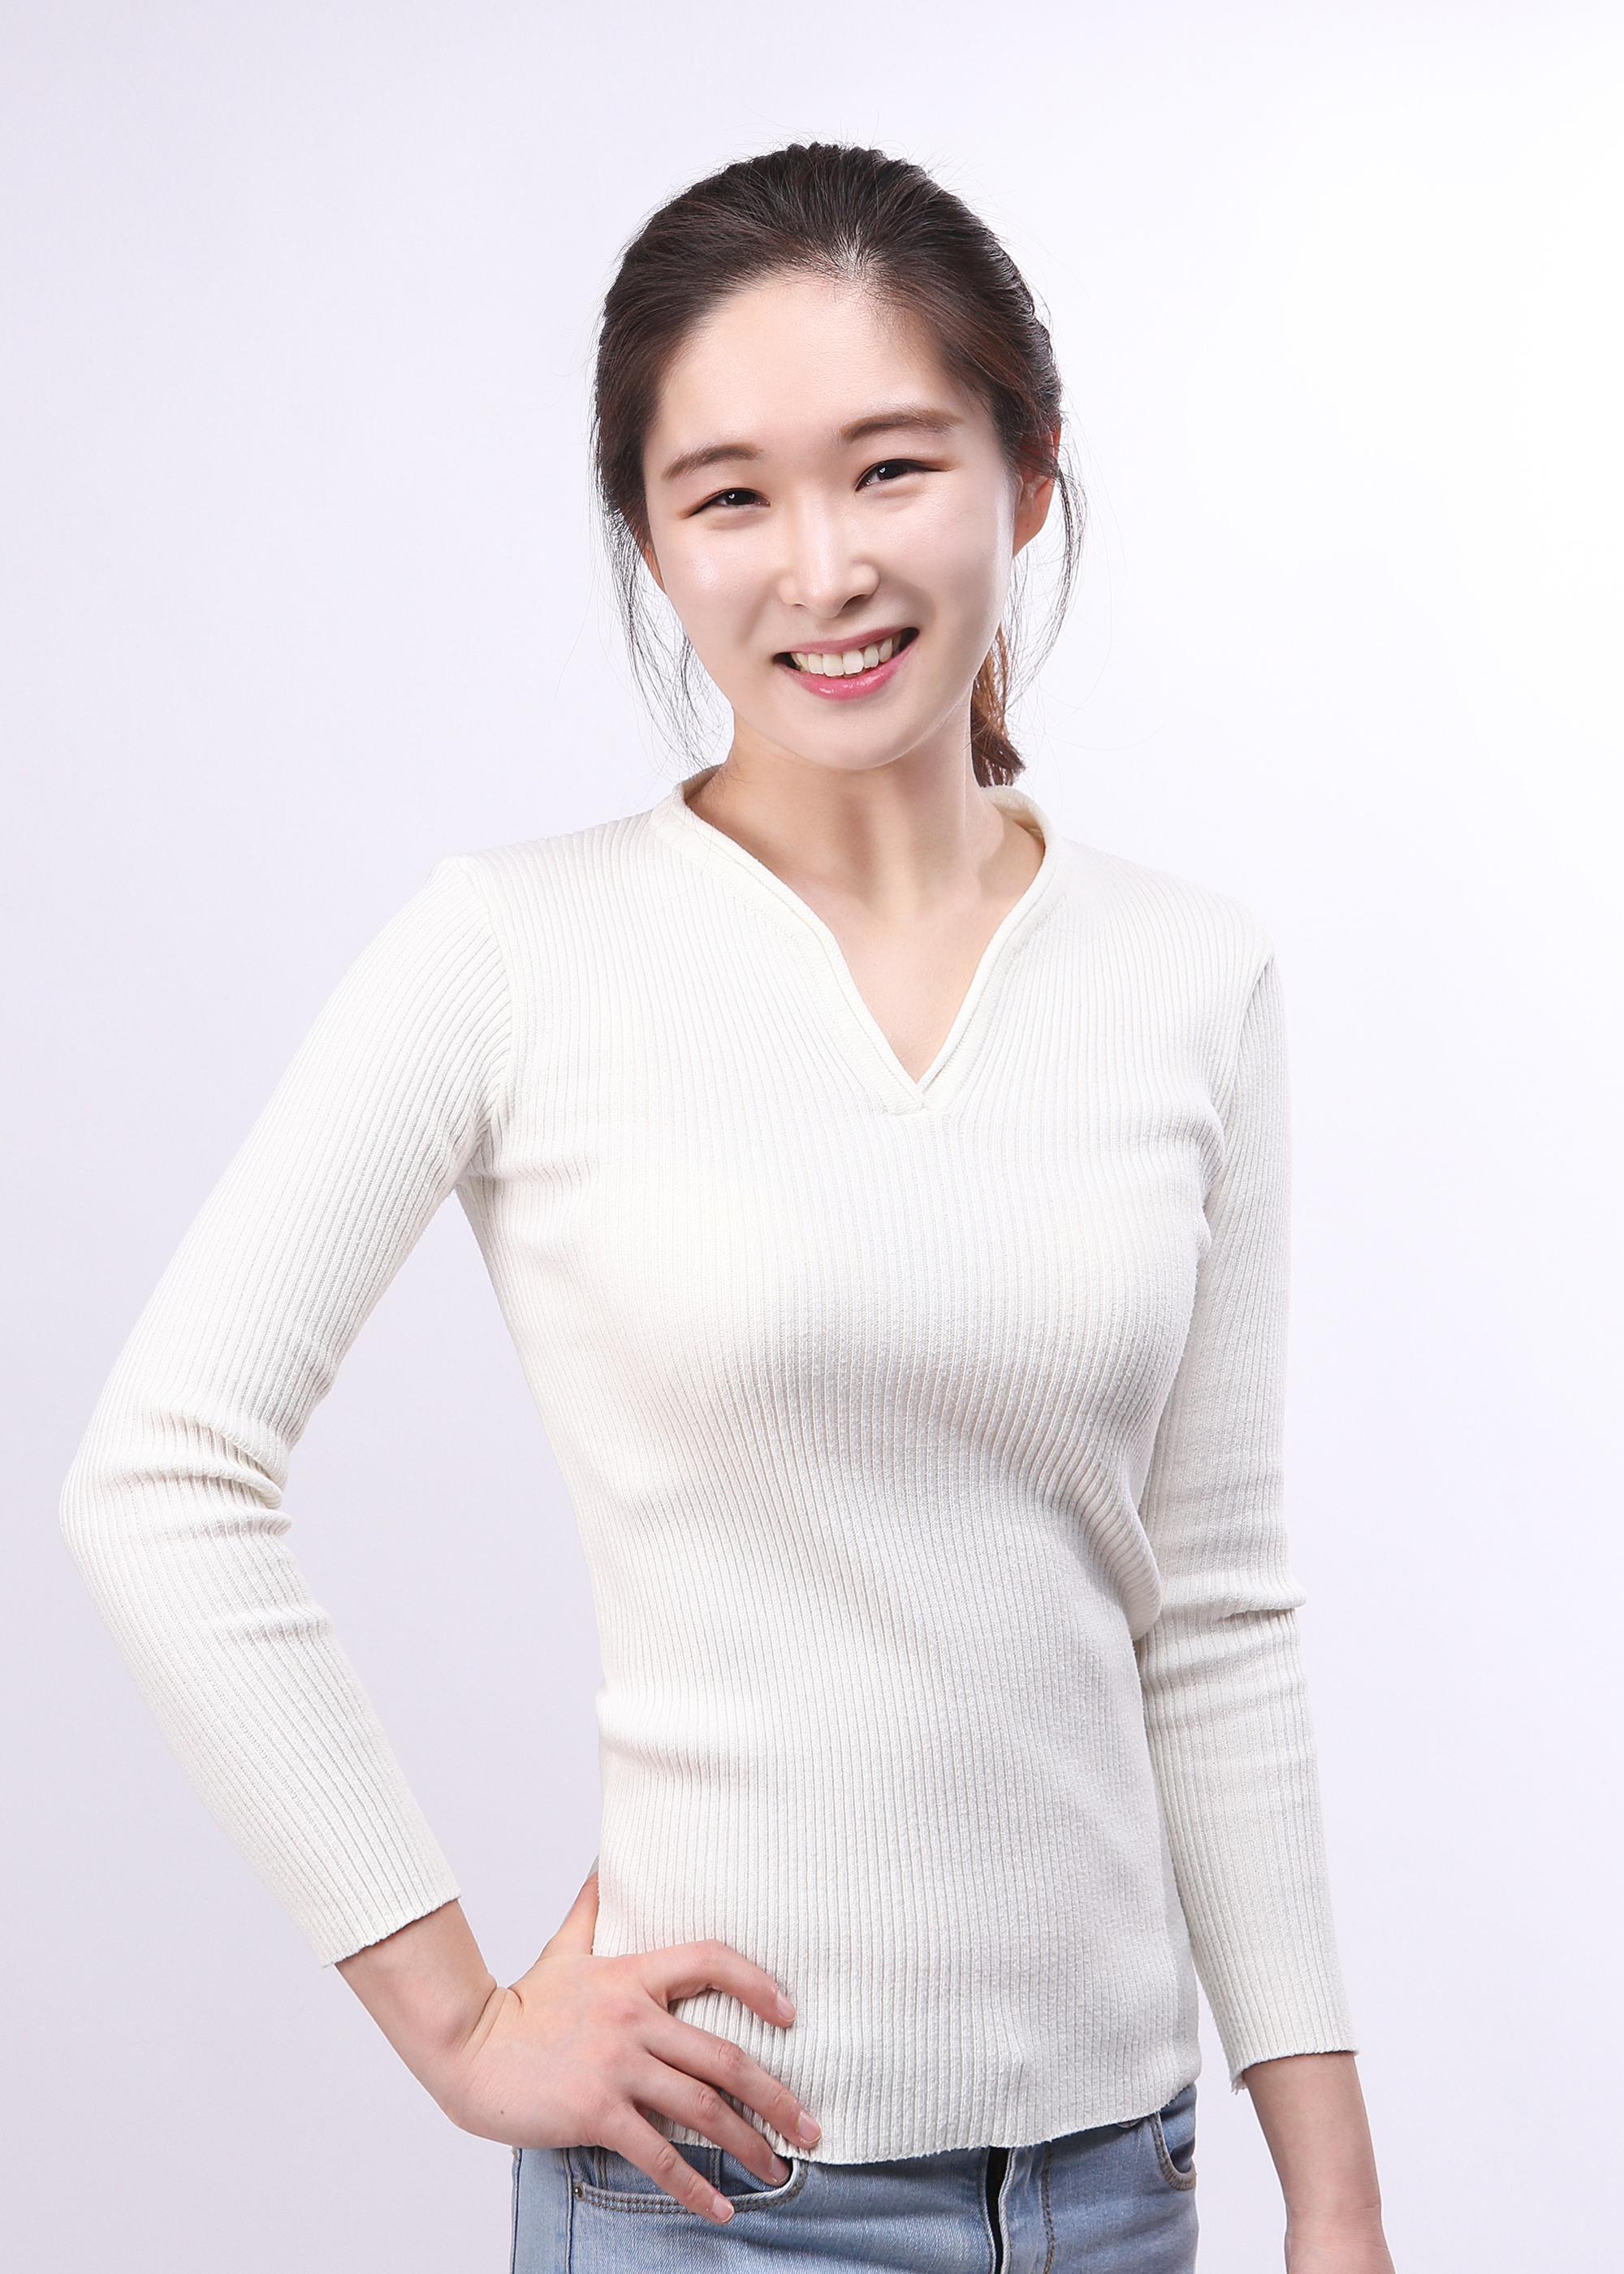 Leegyeongmi3.jpg